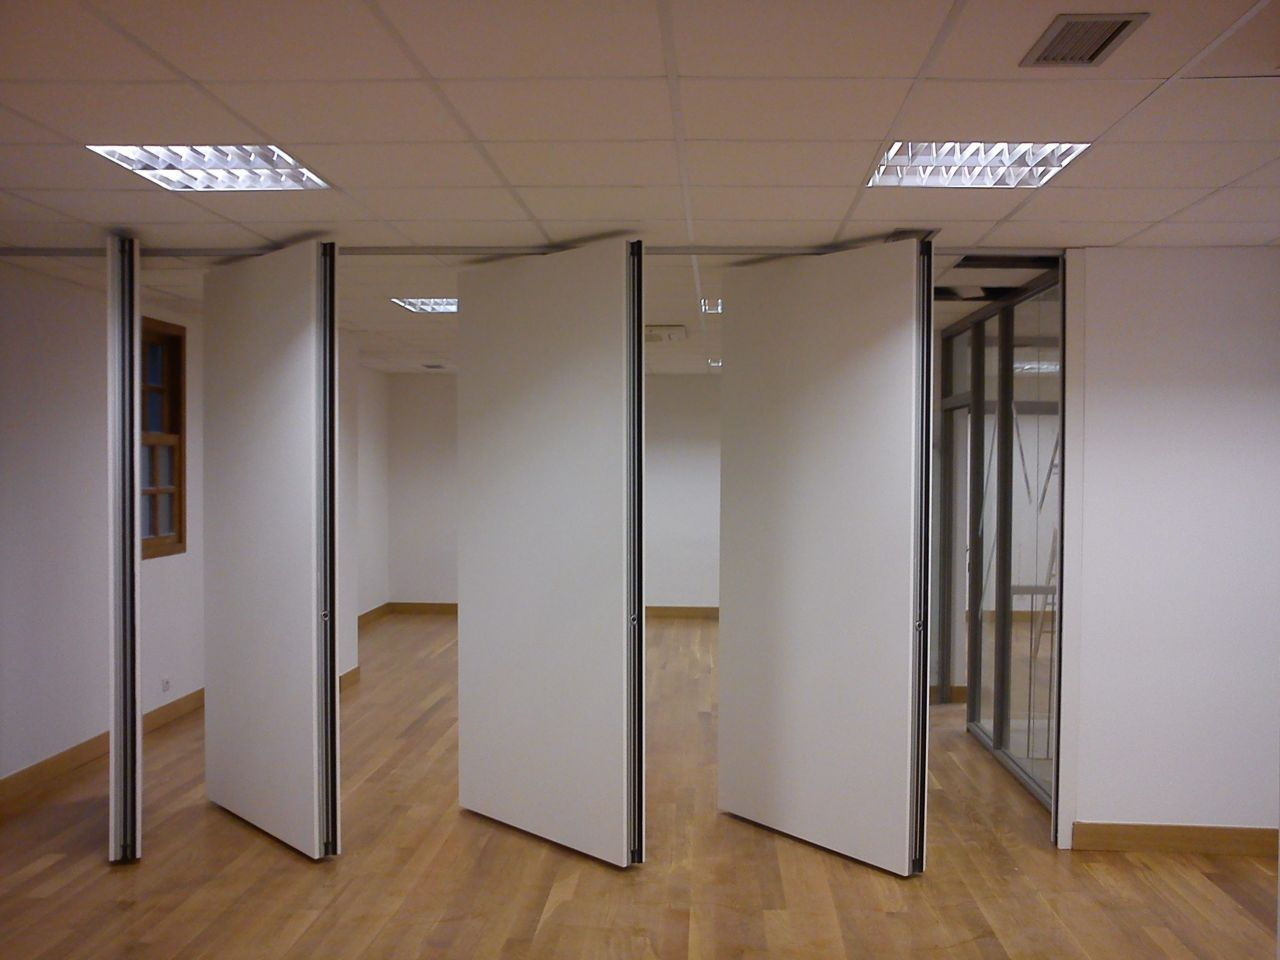 Aislar paredes insonorizar paredes otras estancias placa - Aislar paredes interiores ...